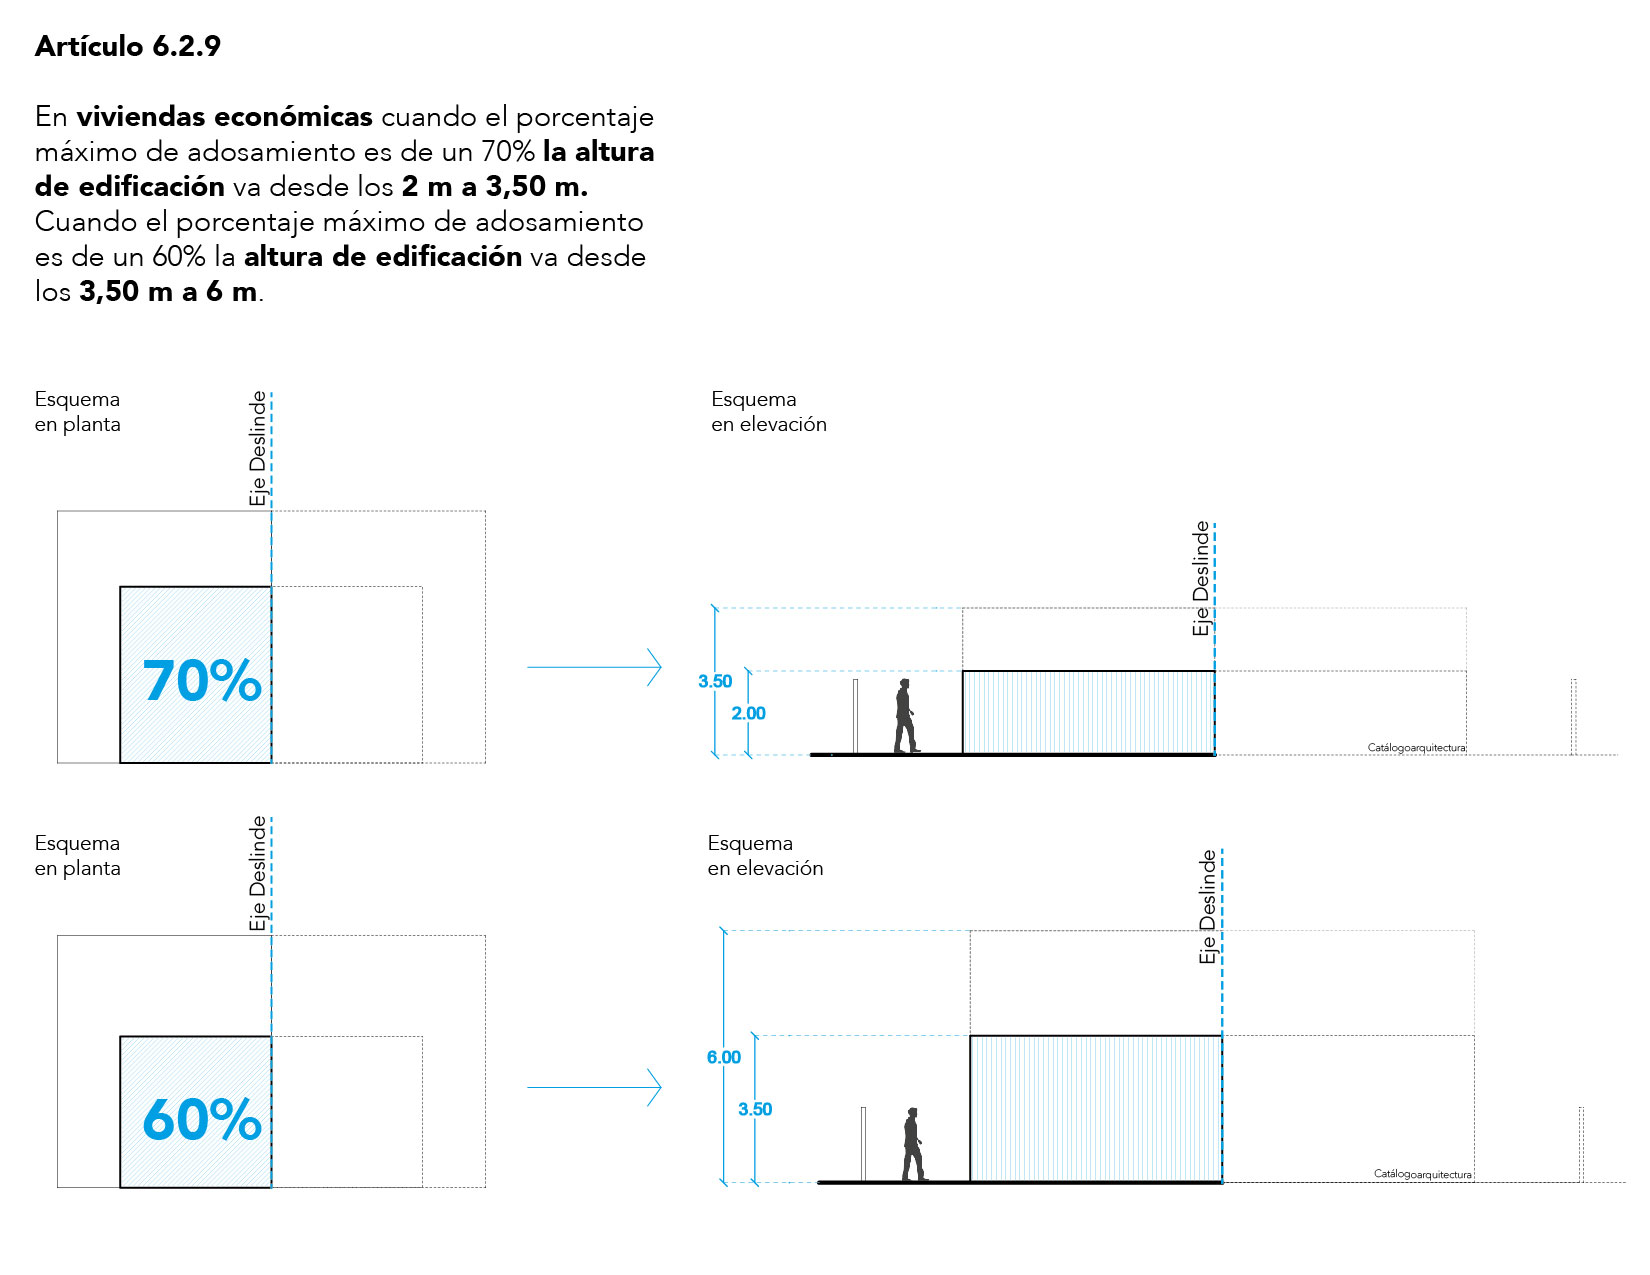 Alturas de edificación para viviendas económicas según normas de urbanización, OGUC, Chile.